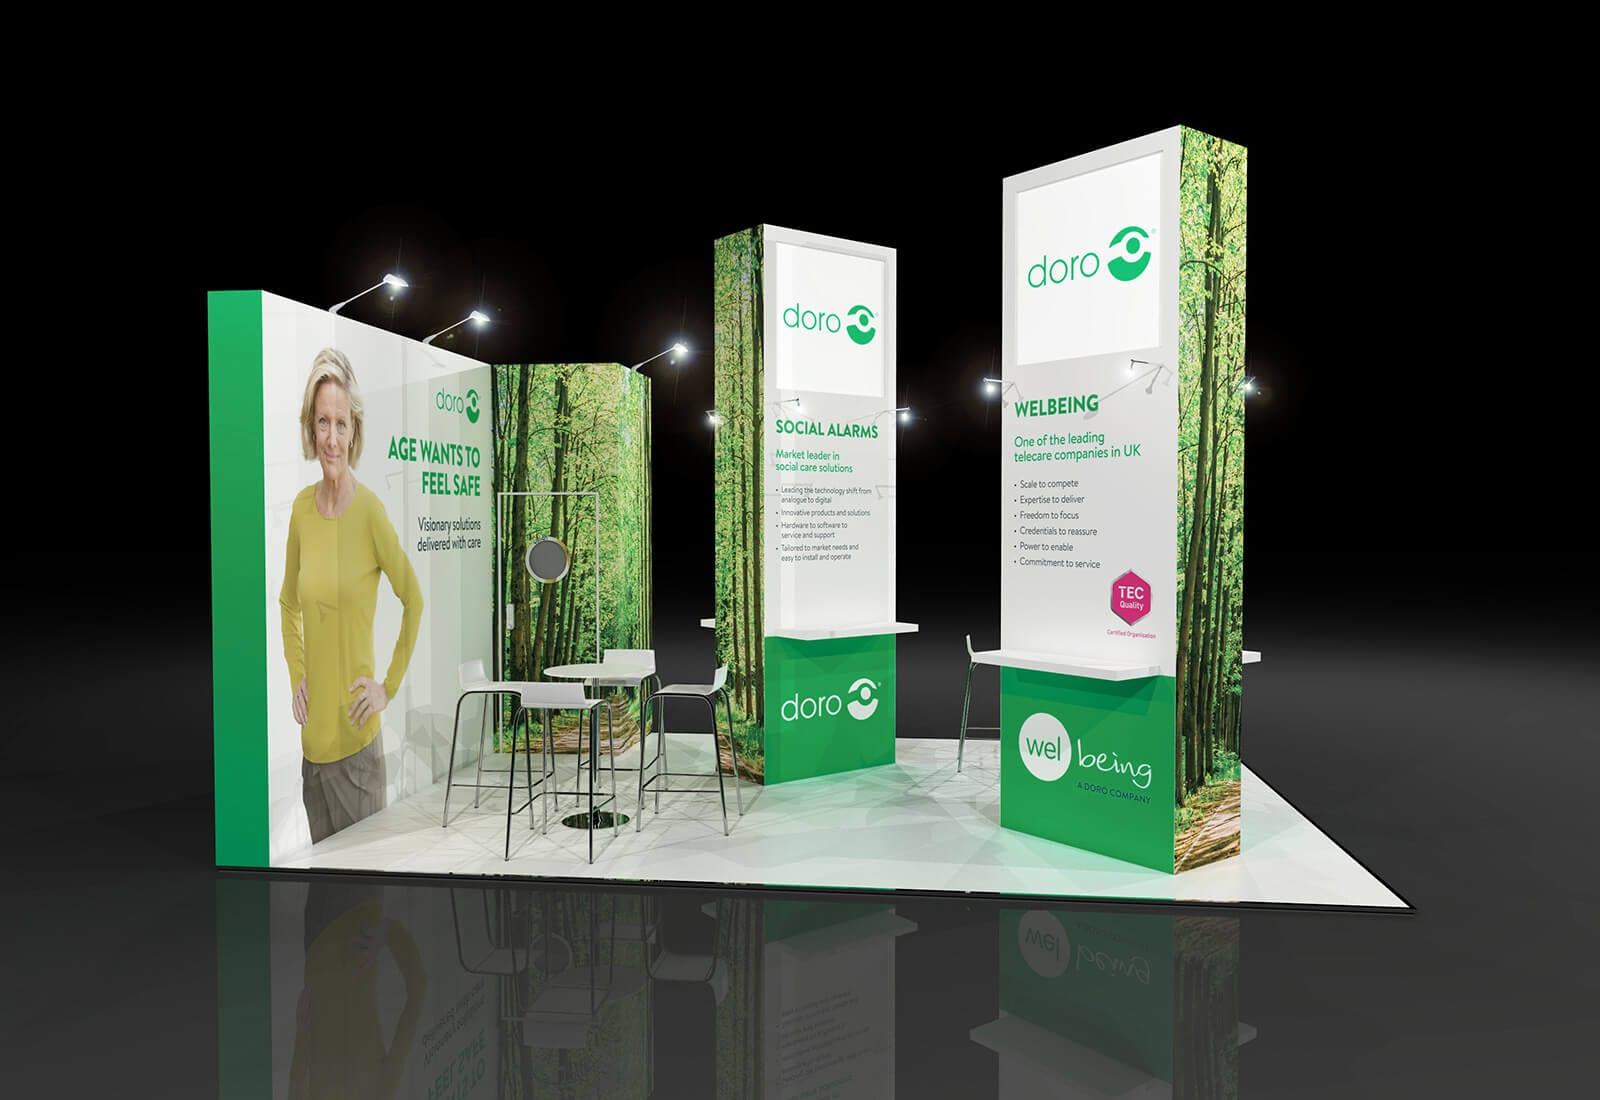 Welbeing & Doro exhibition stand